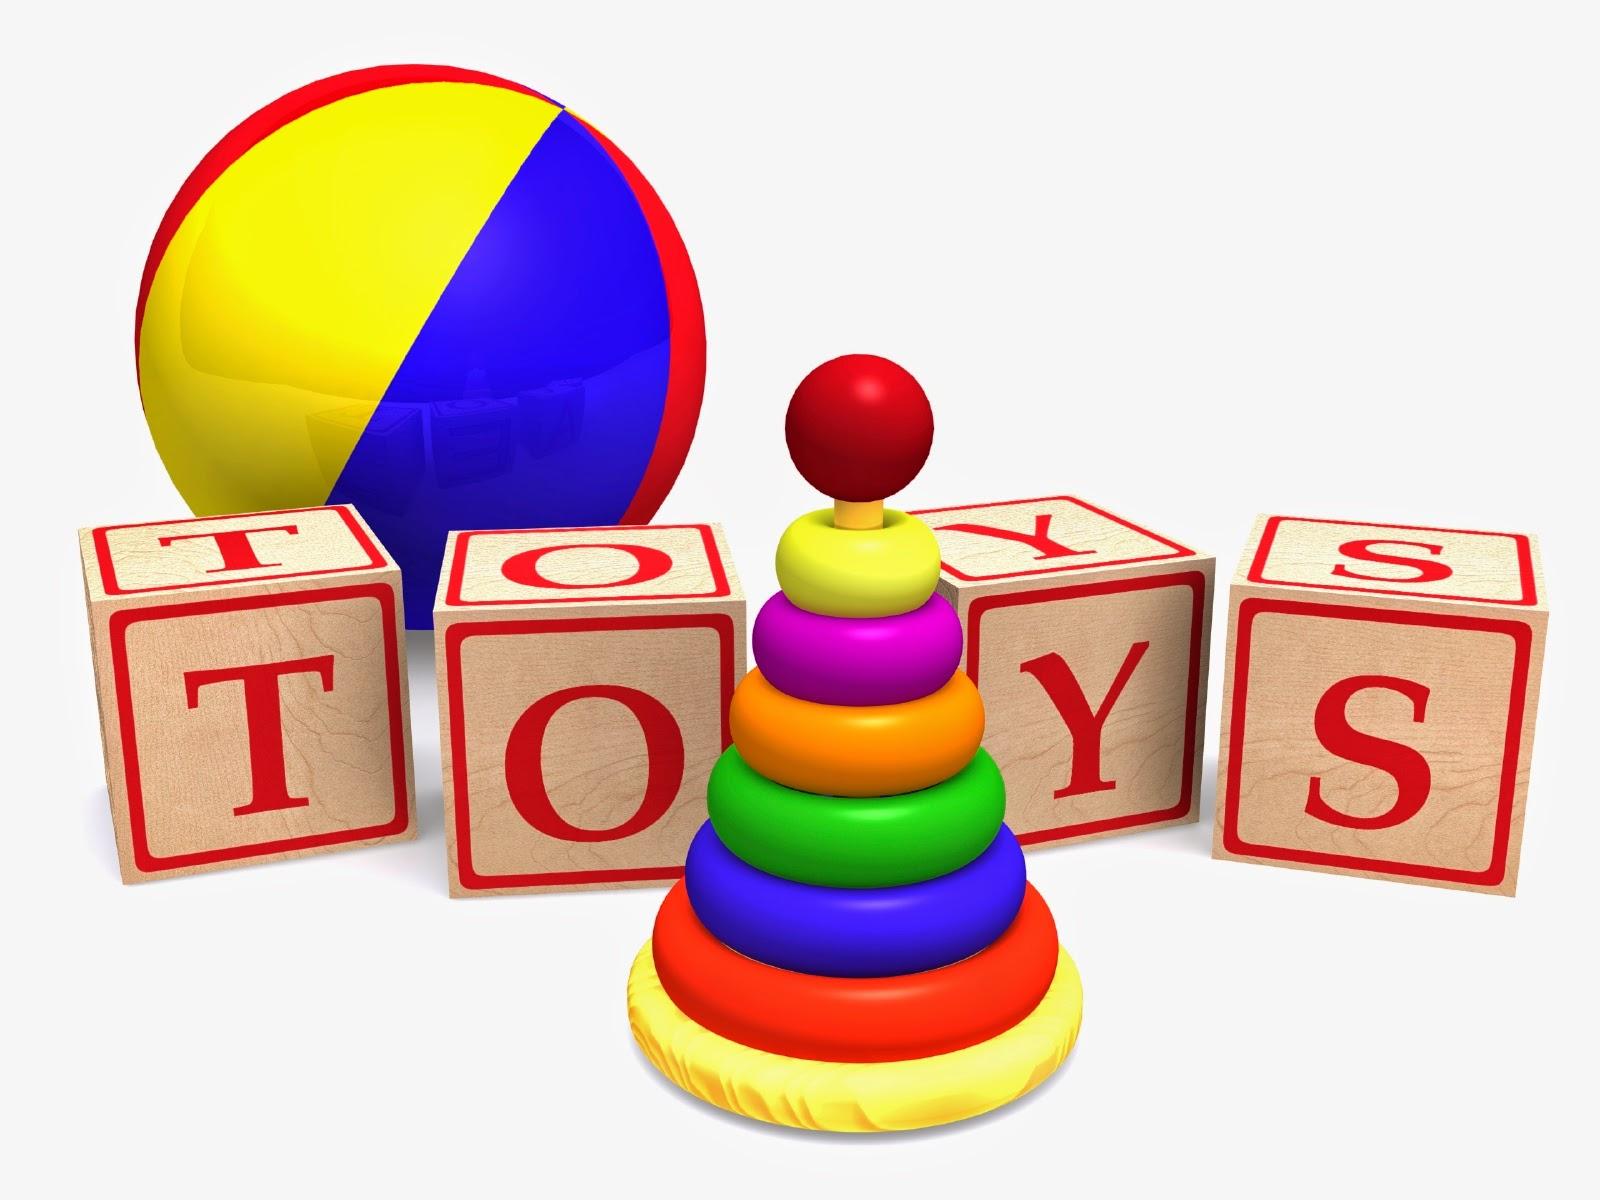 Toys Picture Kids Toys Background Kids Toys Desktop PC Wallpaper 1600x1200